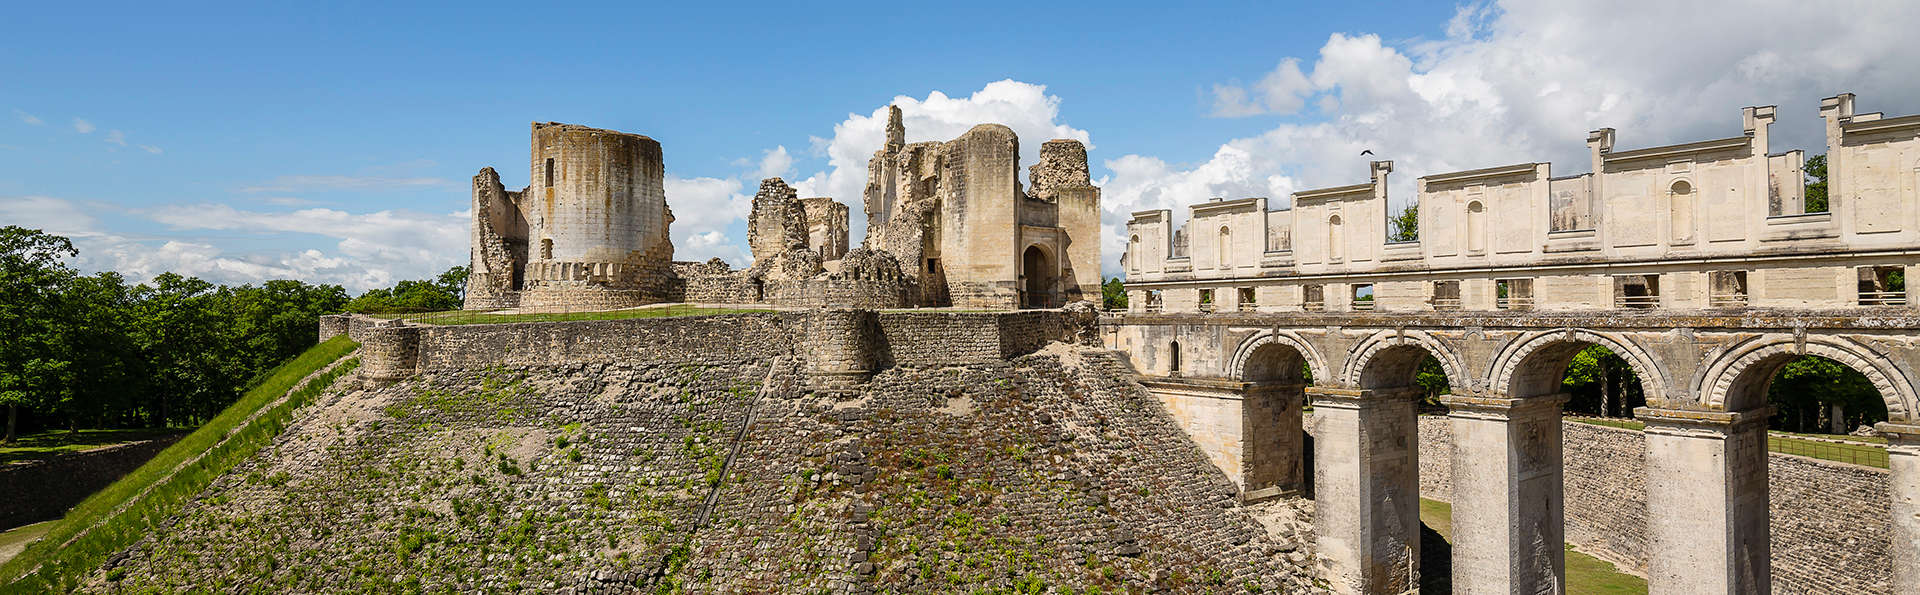 Château de Fere - EDIT_NEW_ruines.jpg